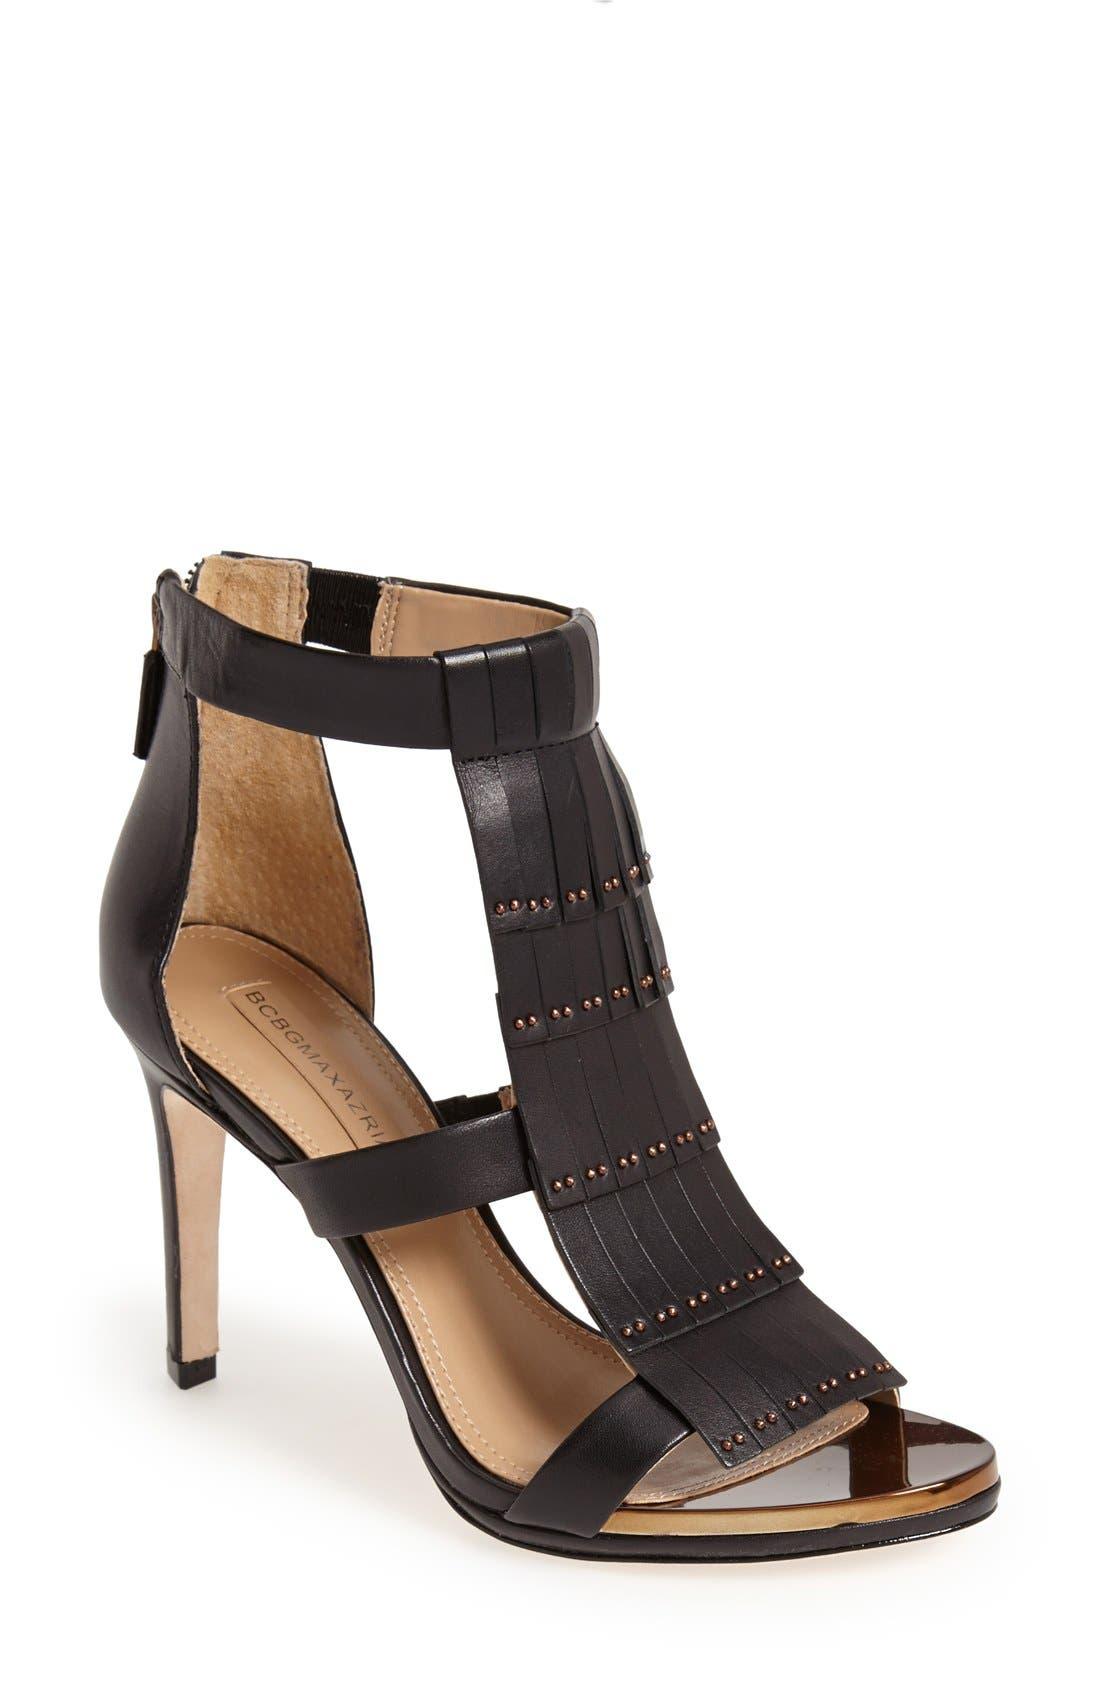 Alternate Image 1 Selected - BCBGMAXAZRIA 'Leigh High' Sandal (Women)